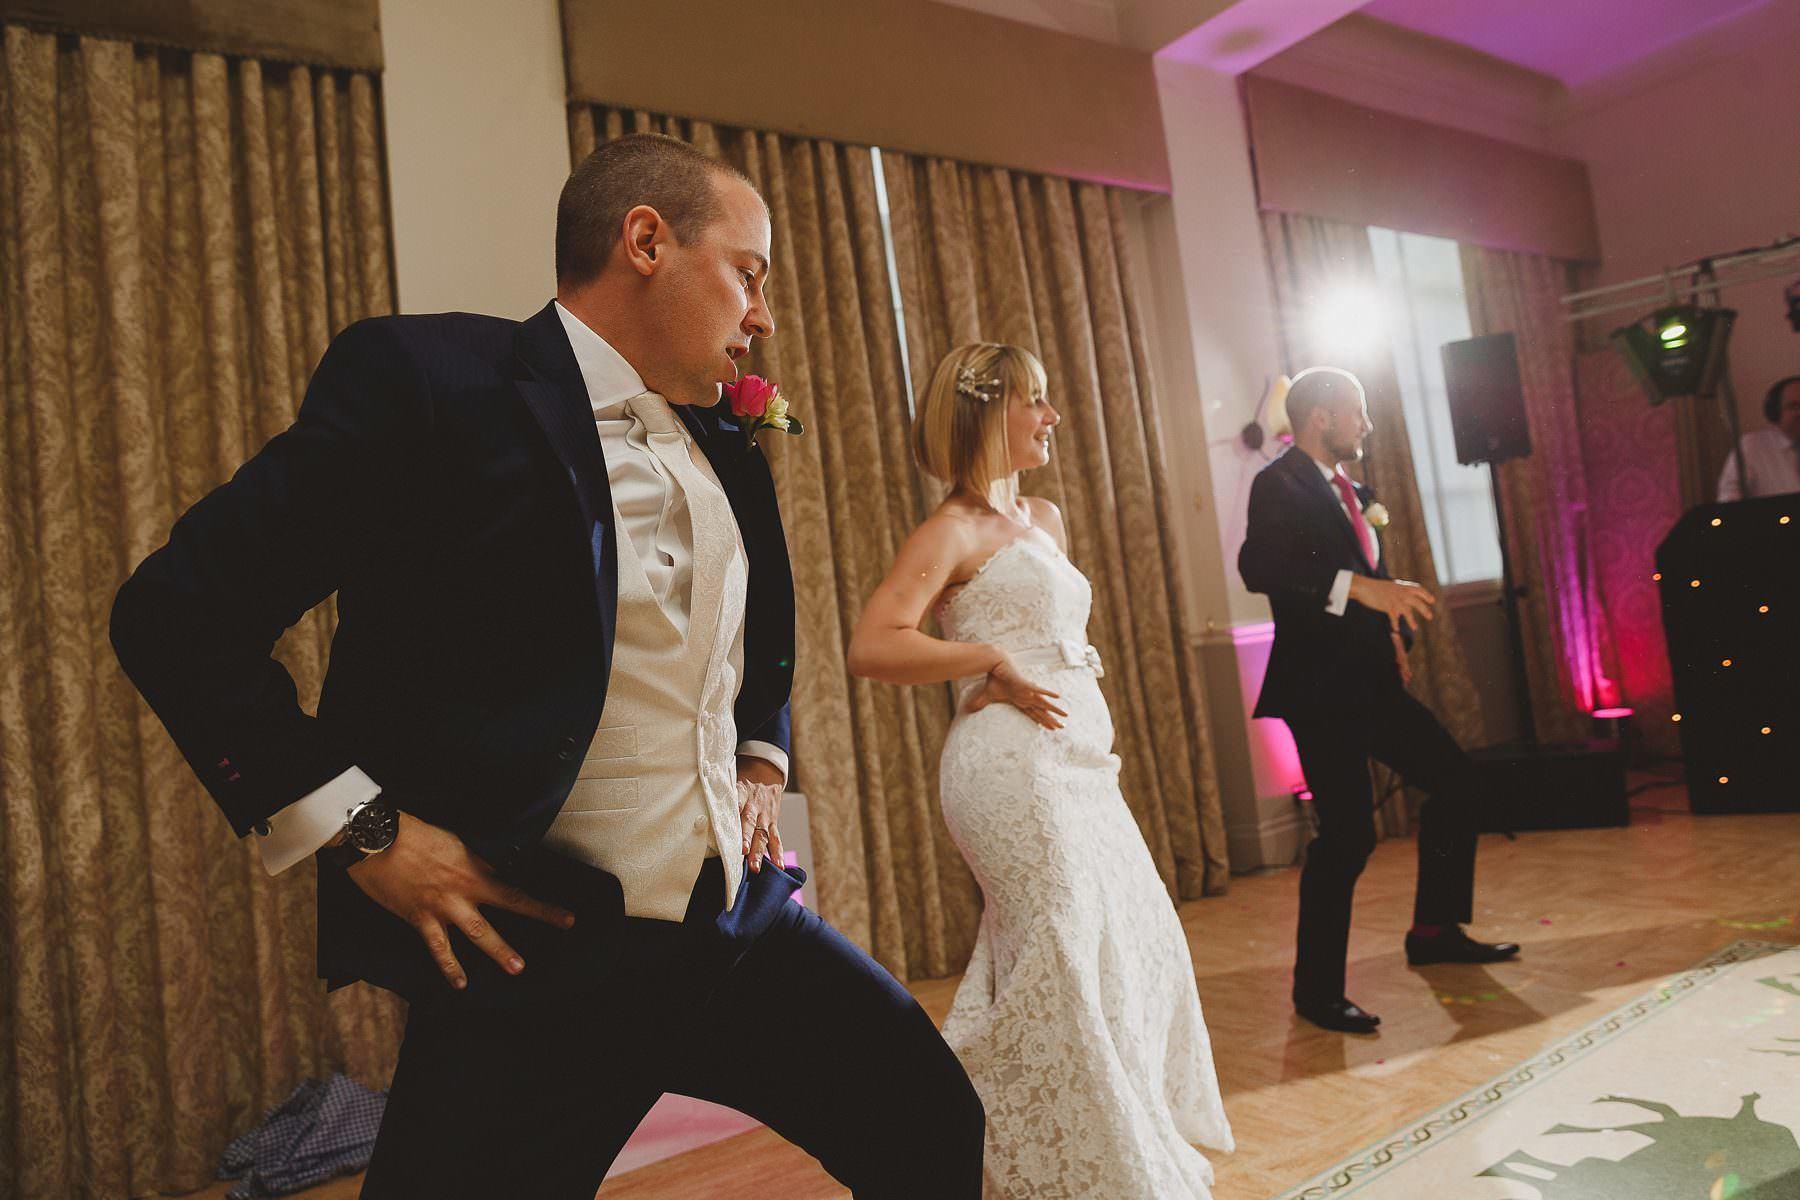 apache first dance at a wedding